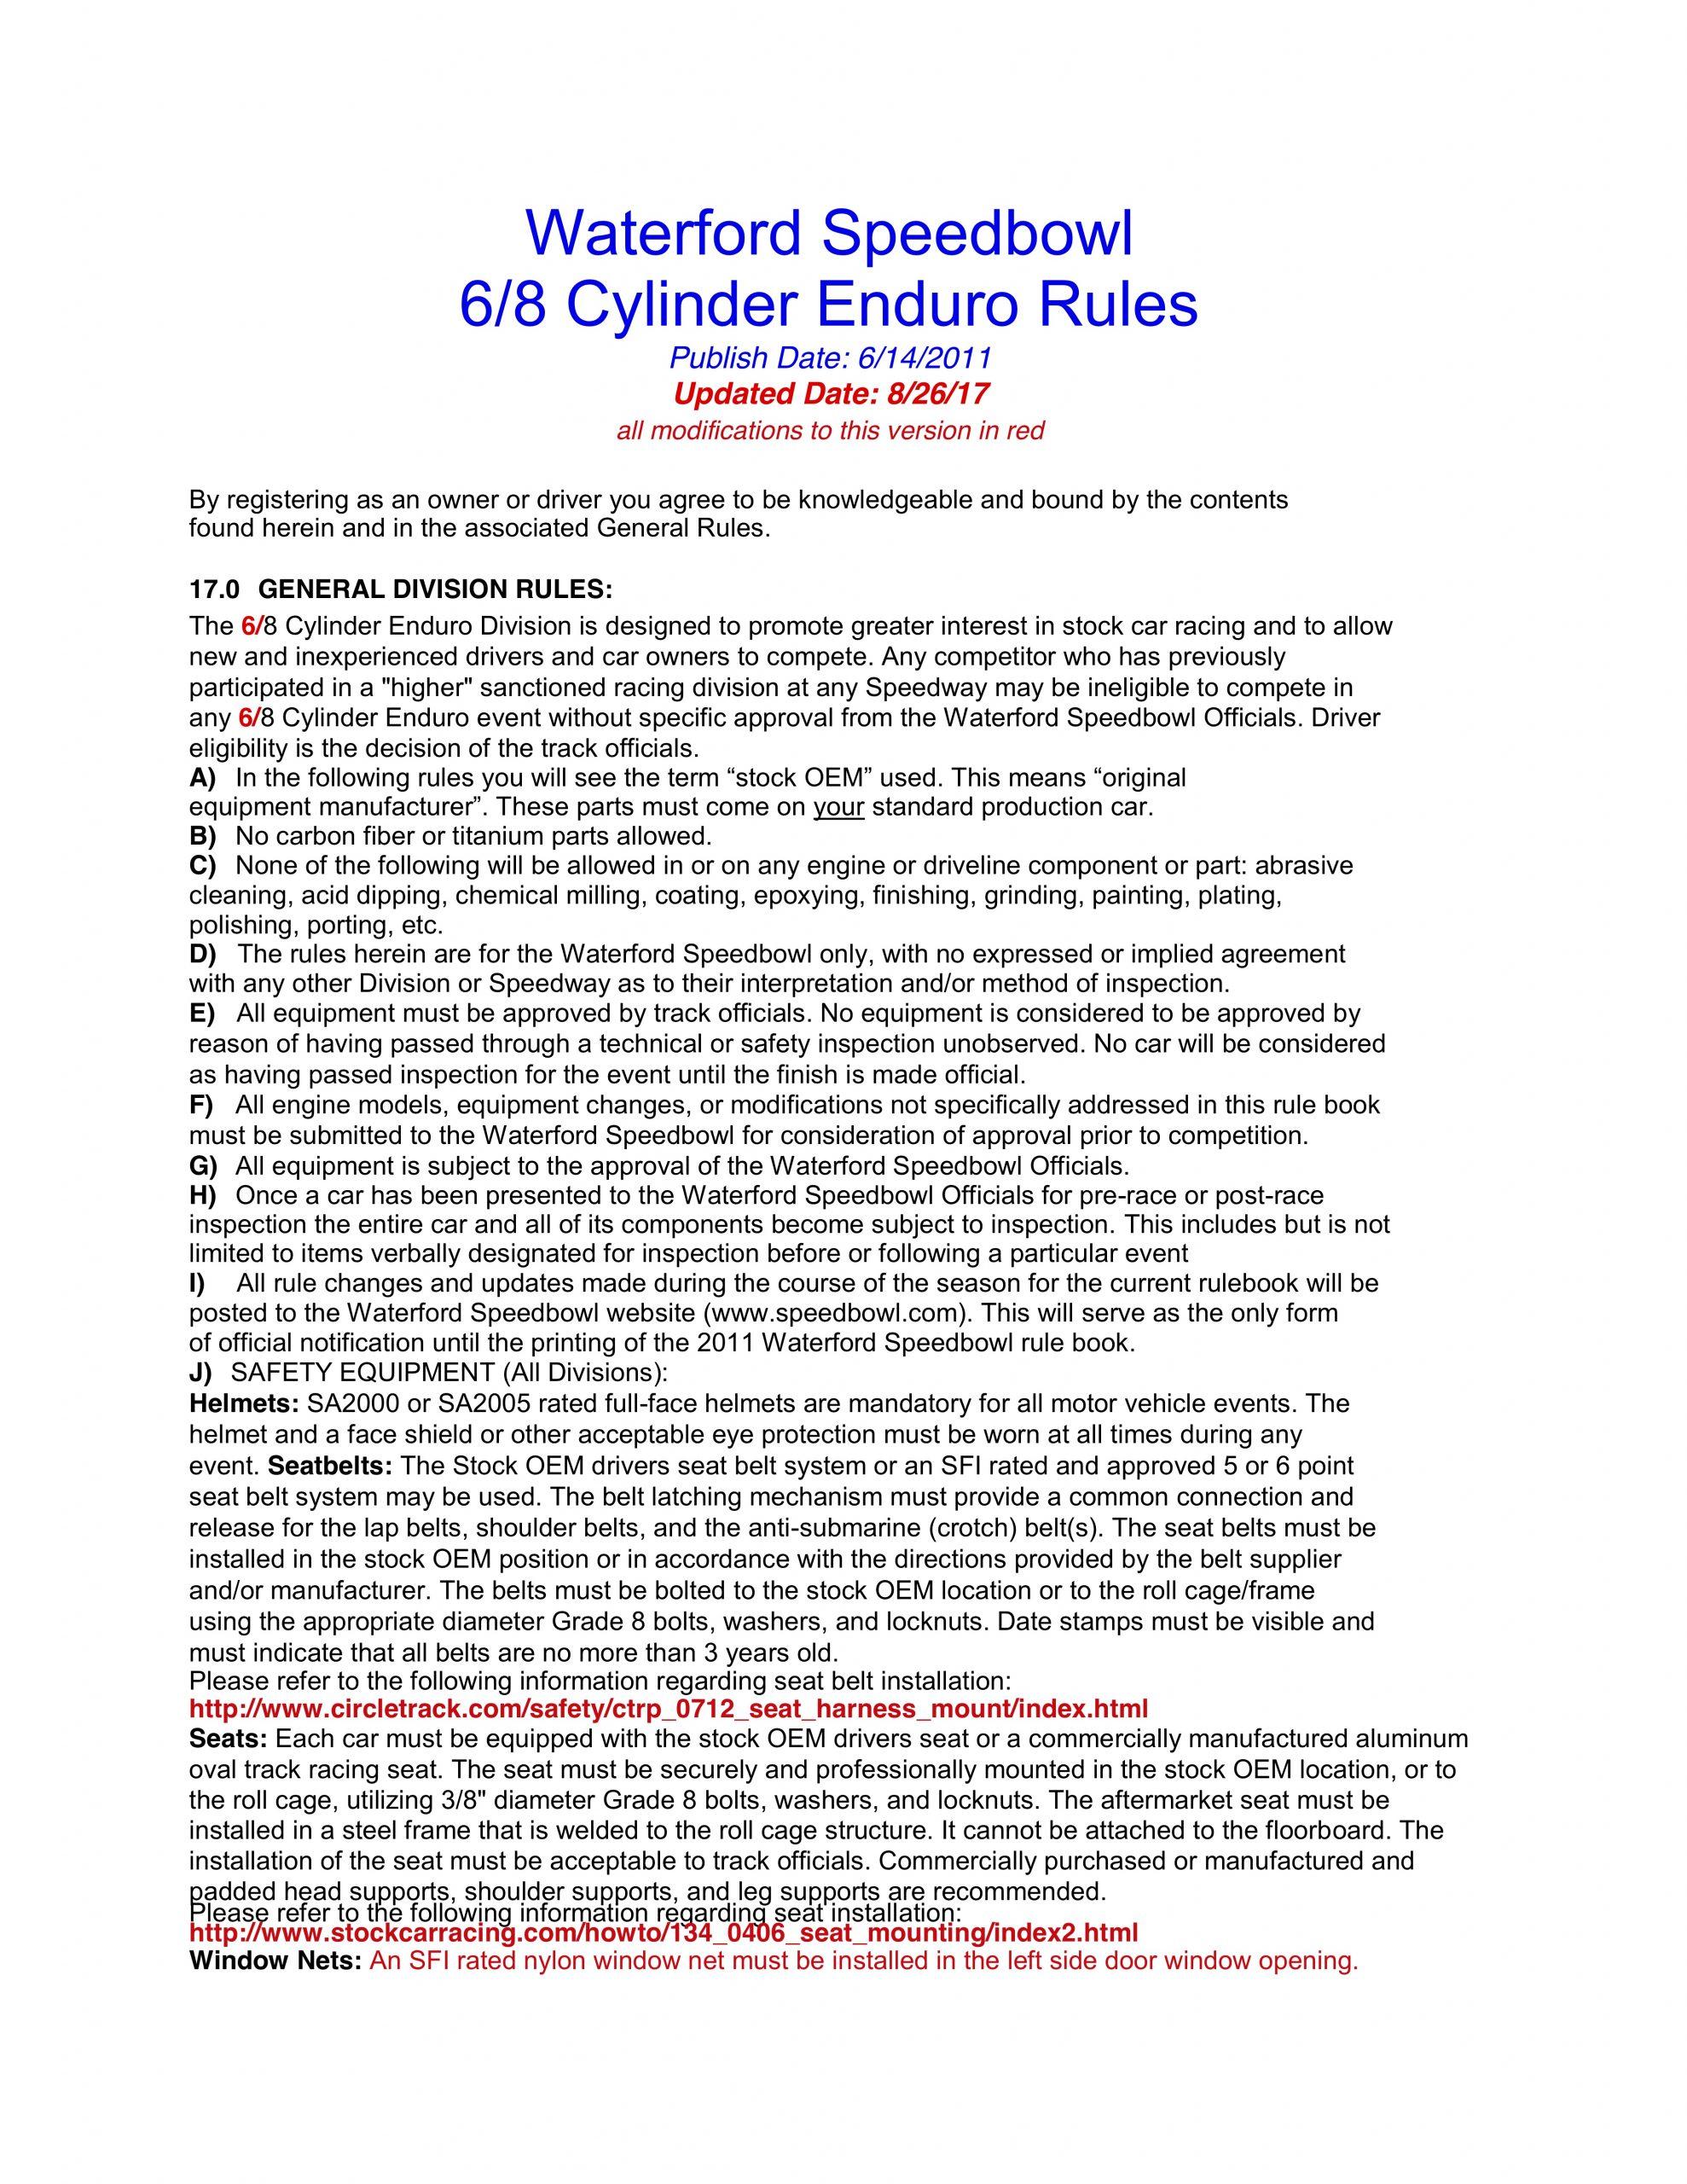 2020 6/8 Cylinder Enduro Rules